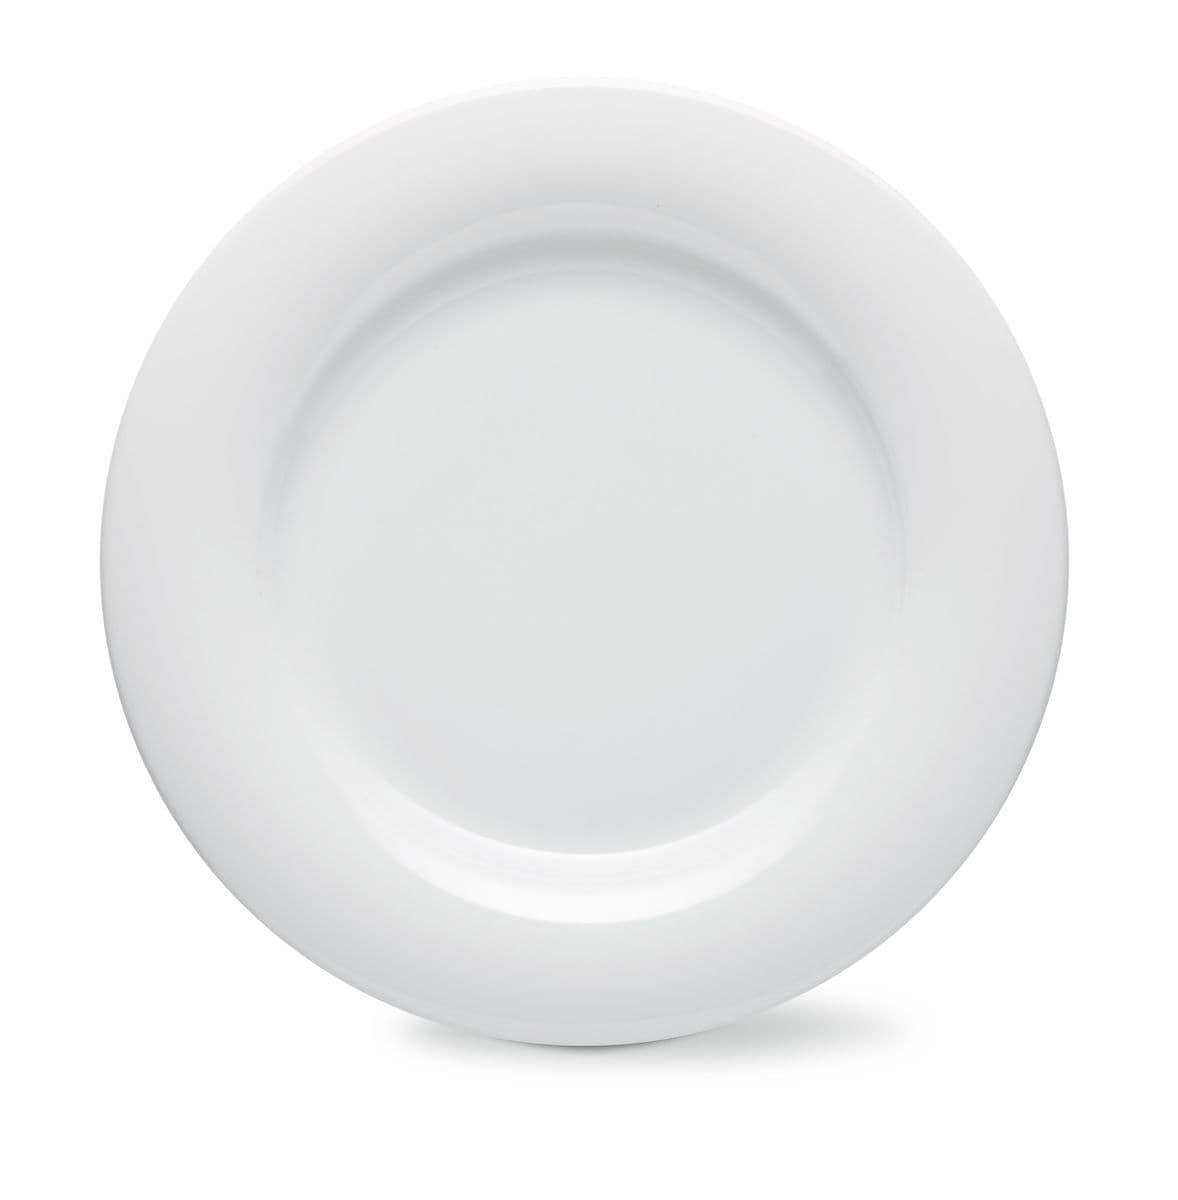 Cucina & Tavola COOL Assiette 27.5cm